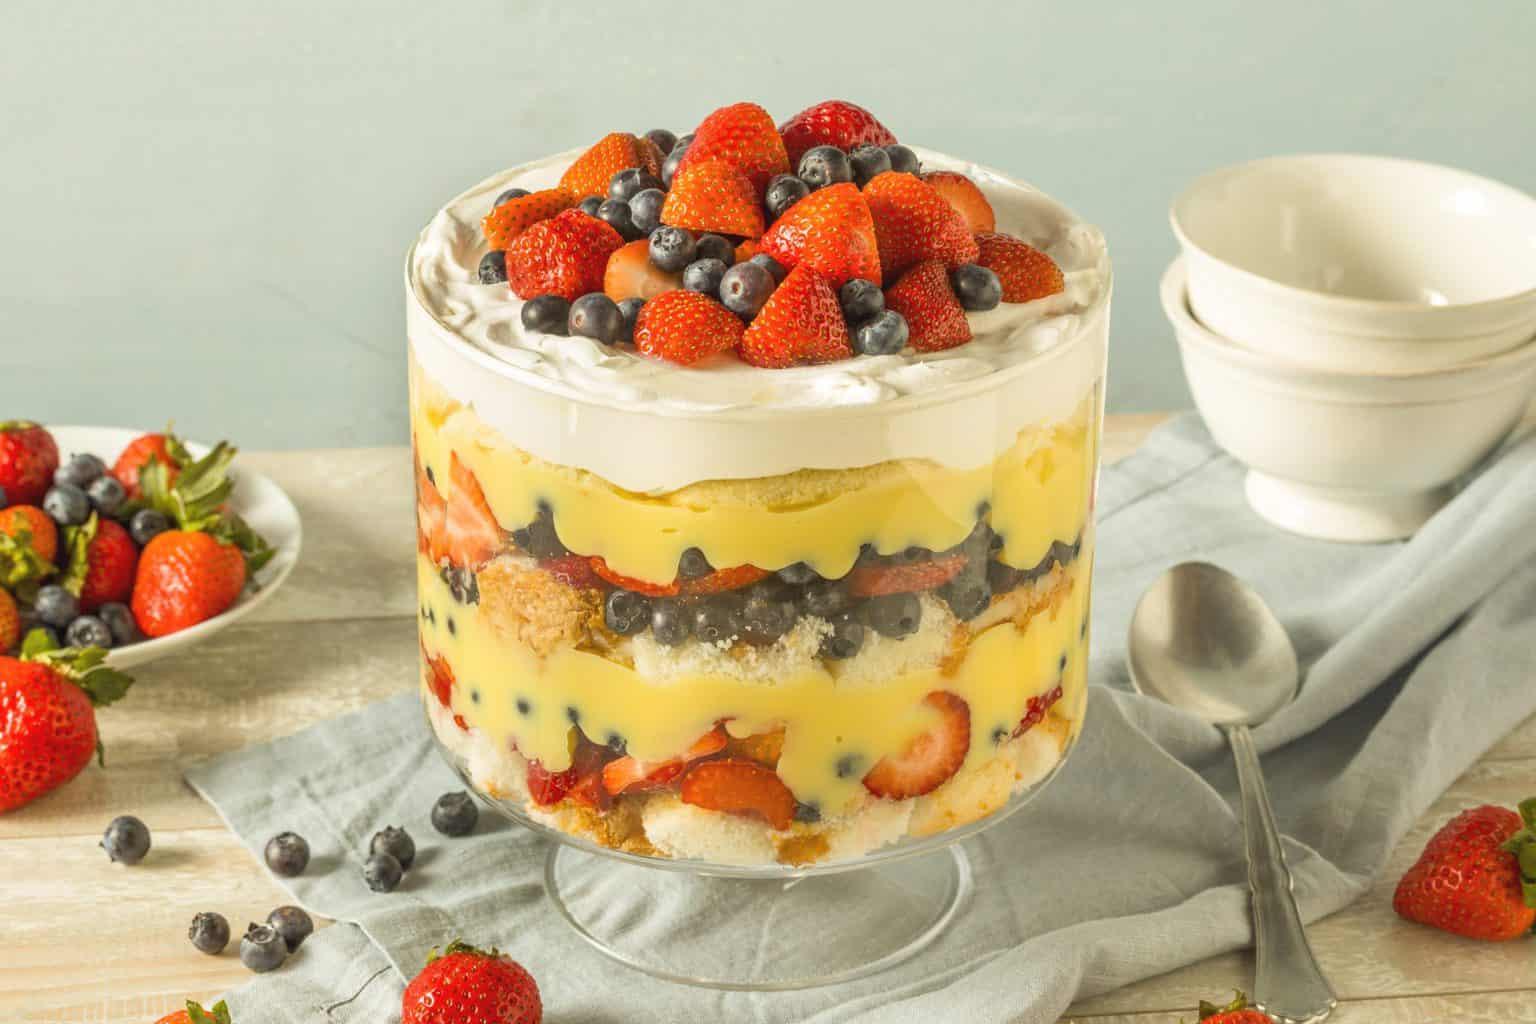 keto trifle dessert ready to serve